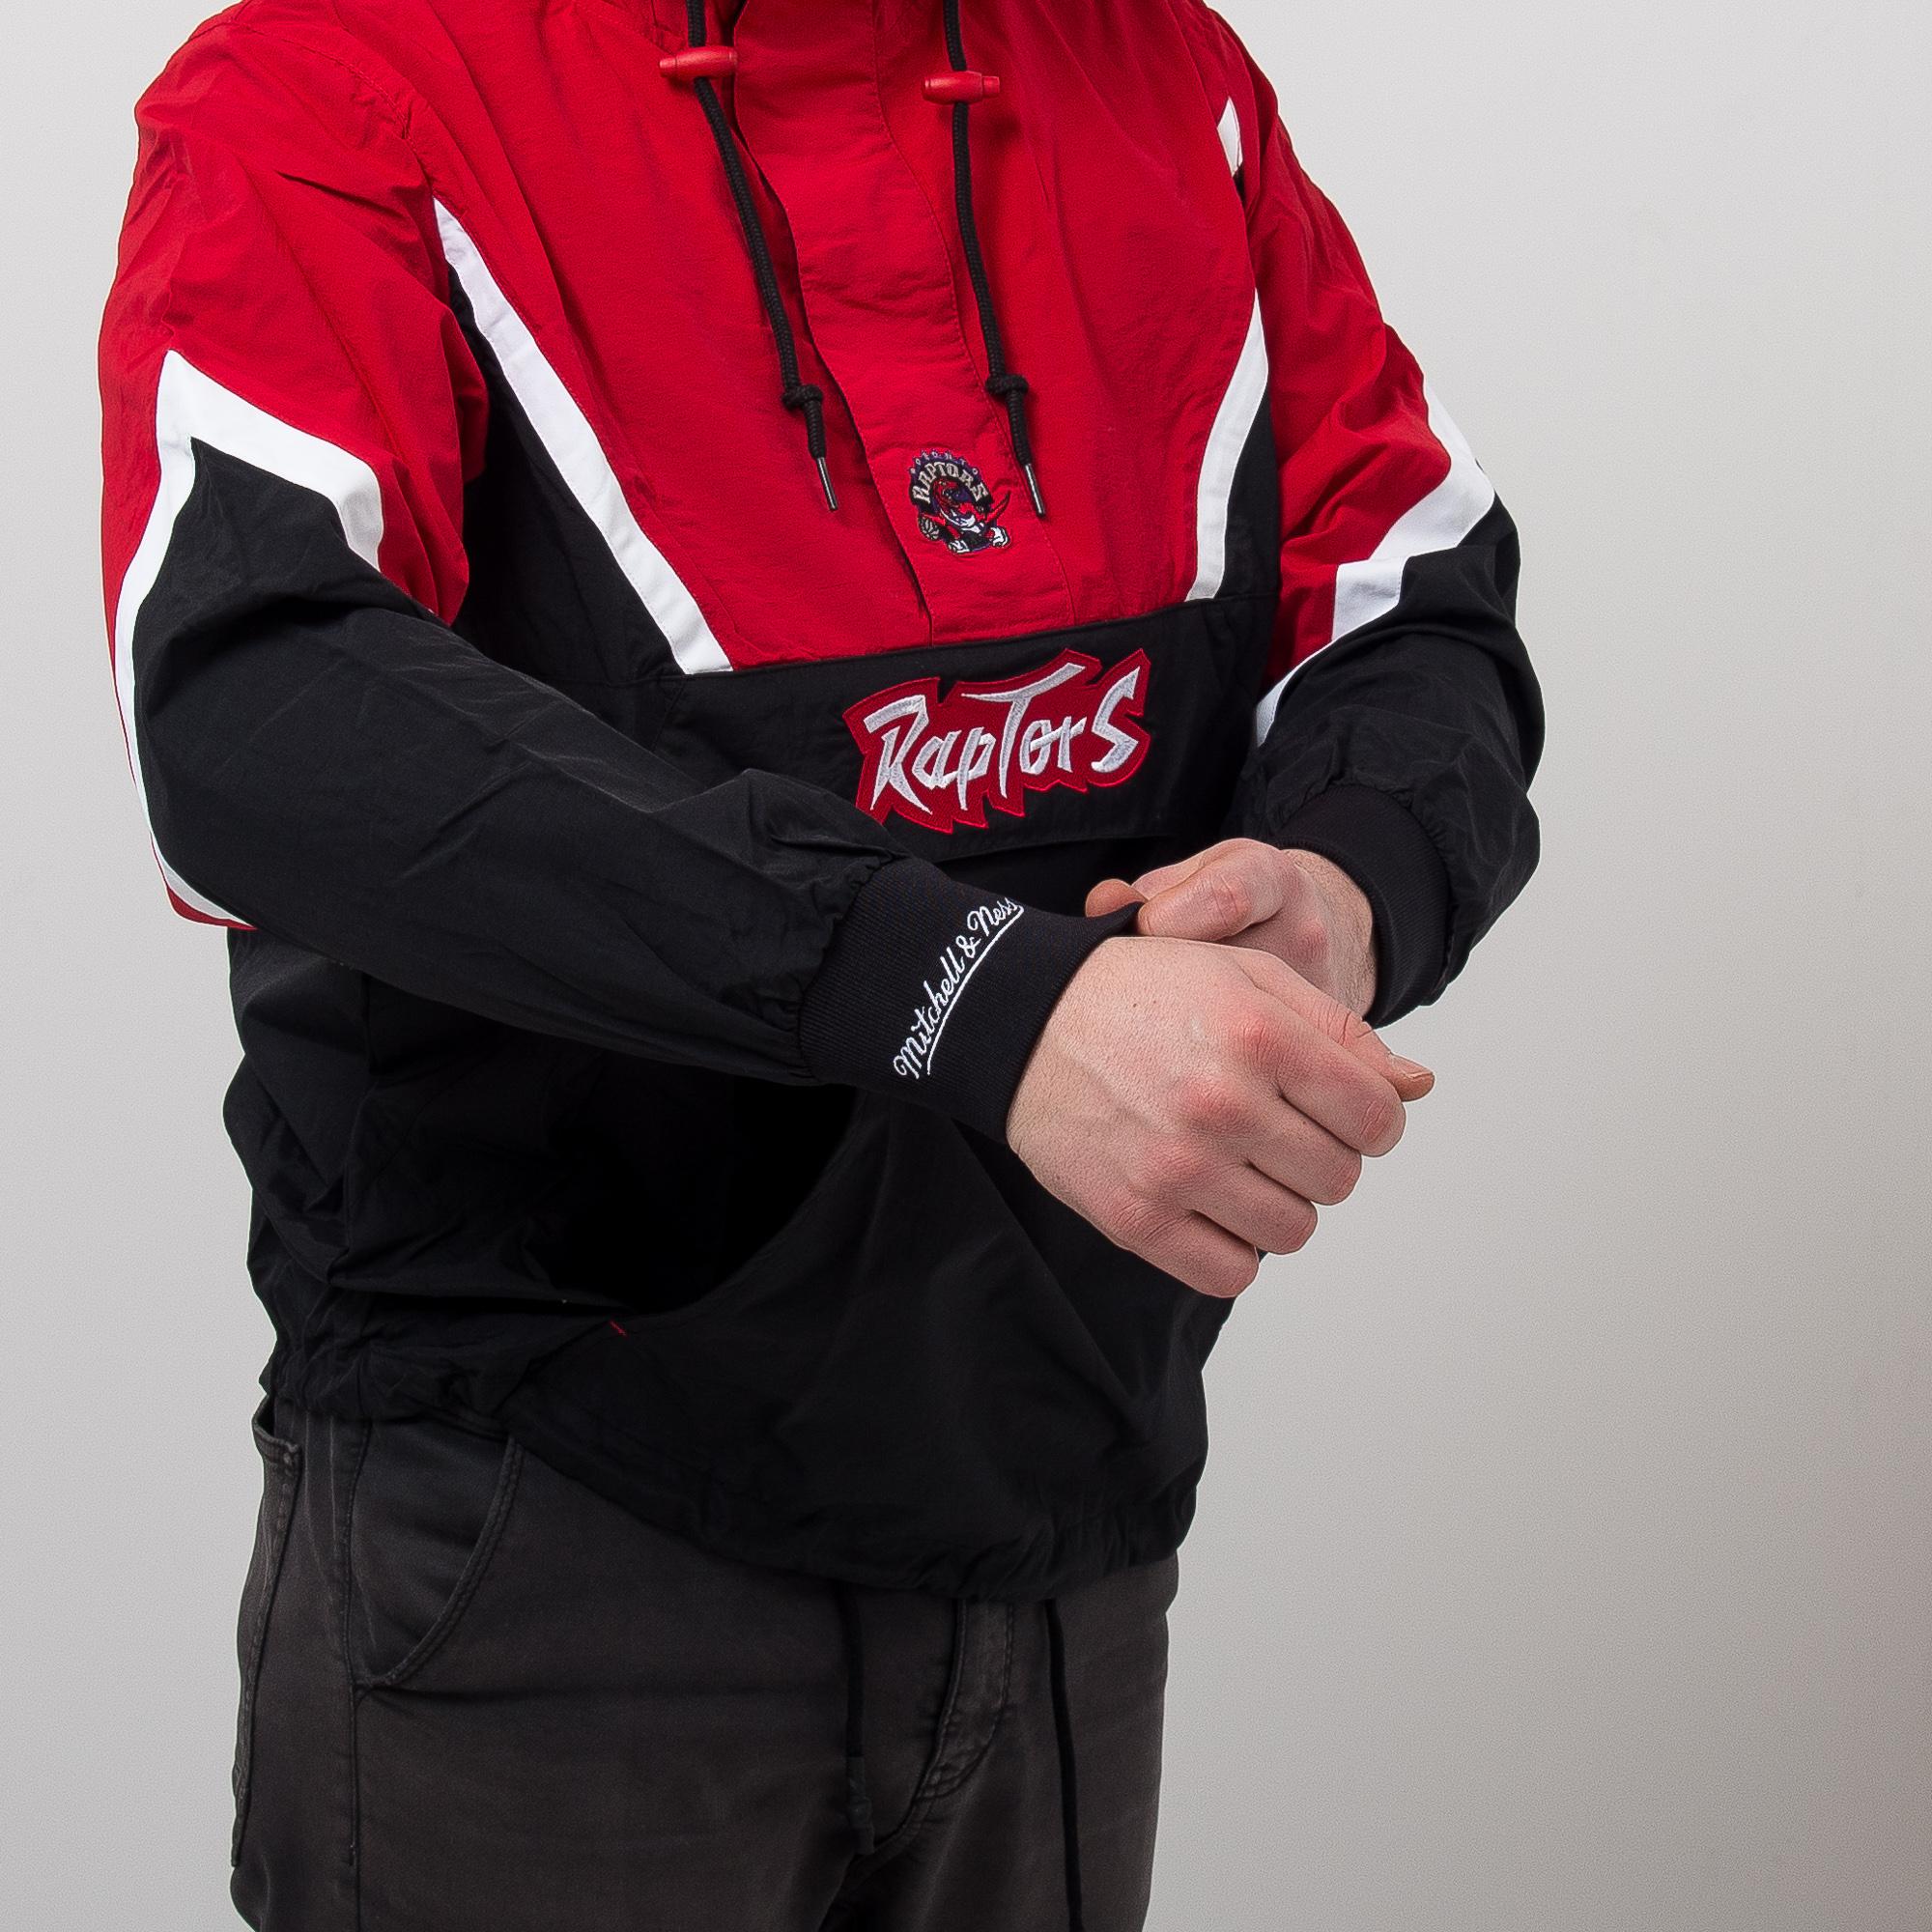 1382dd42c9a Mitchell   Ness NBA Toronto Raptors Half Zip Anorak Jacket - NBA ...